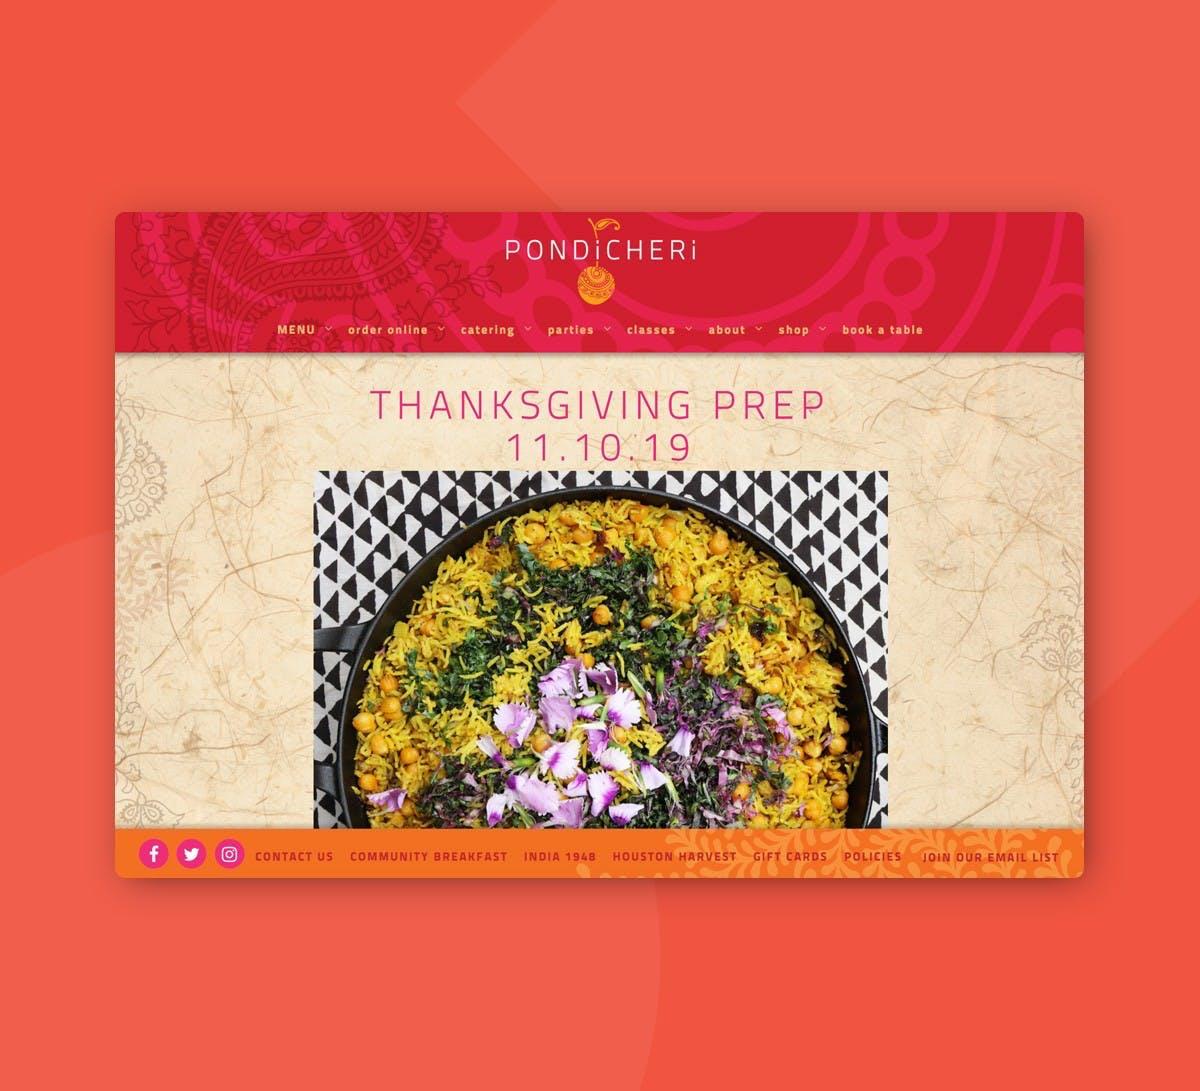 Pondicheri's Thanksgiving Prep event page